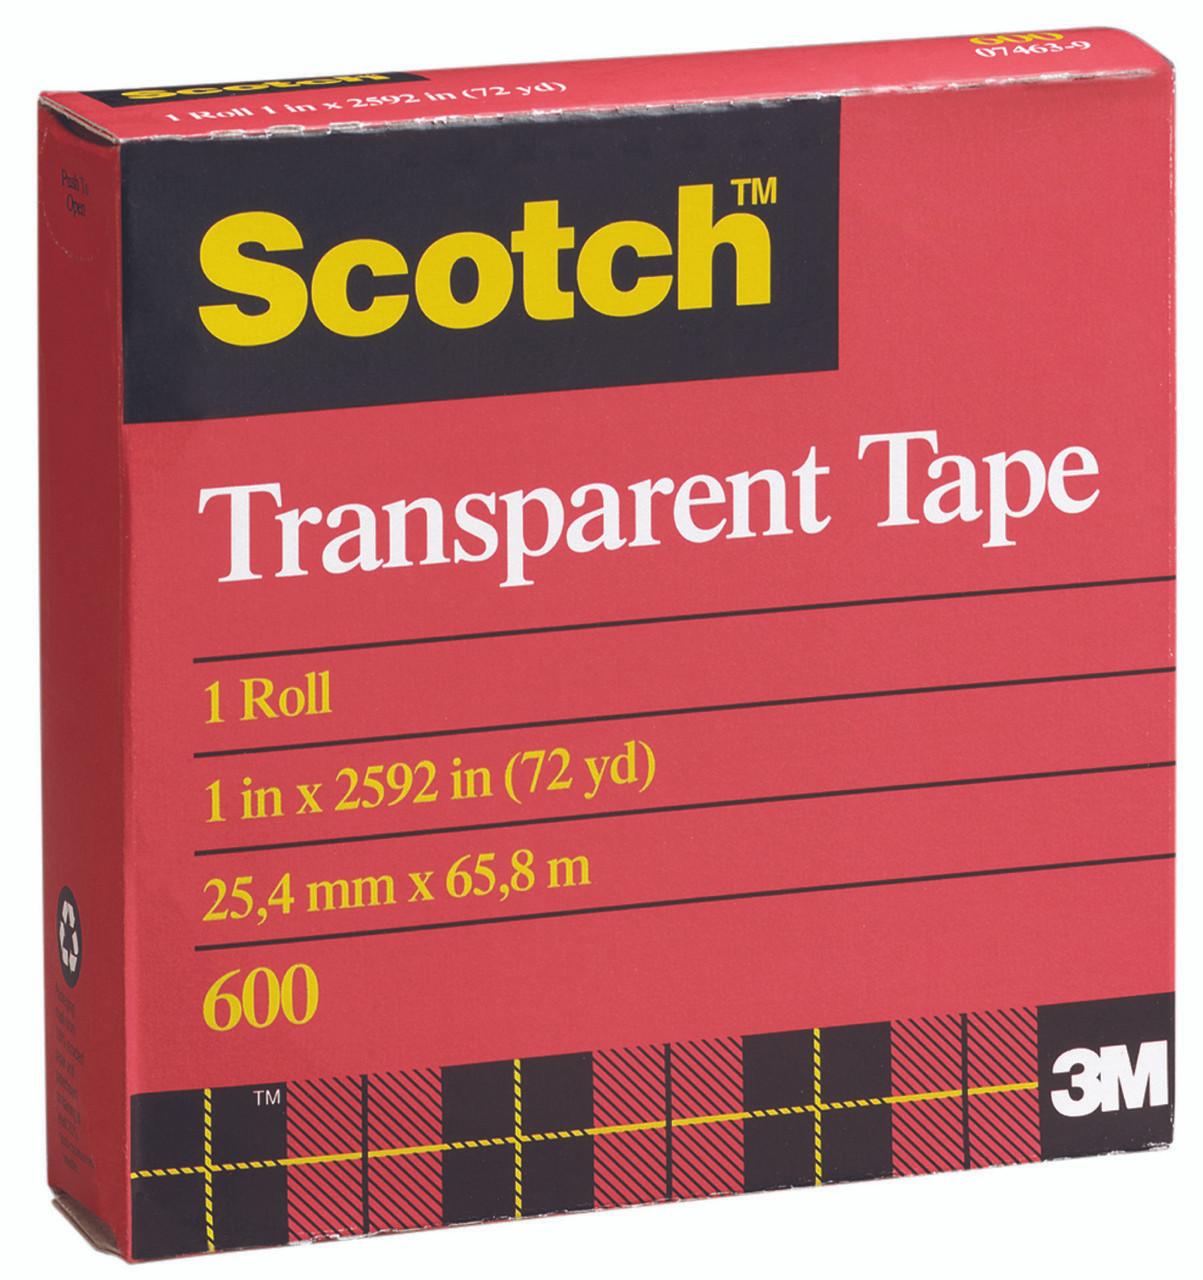 3M Scotch Transparent Tape 600